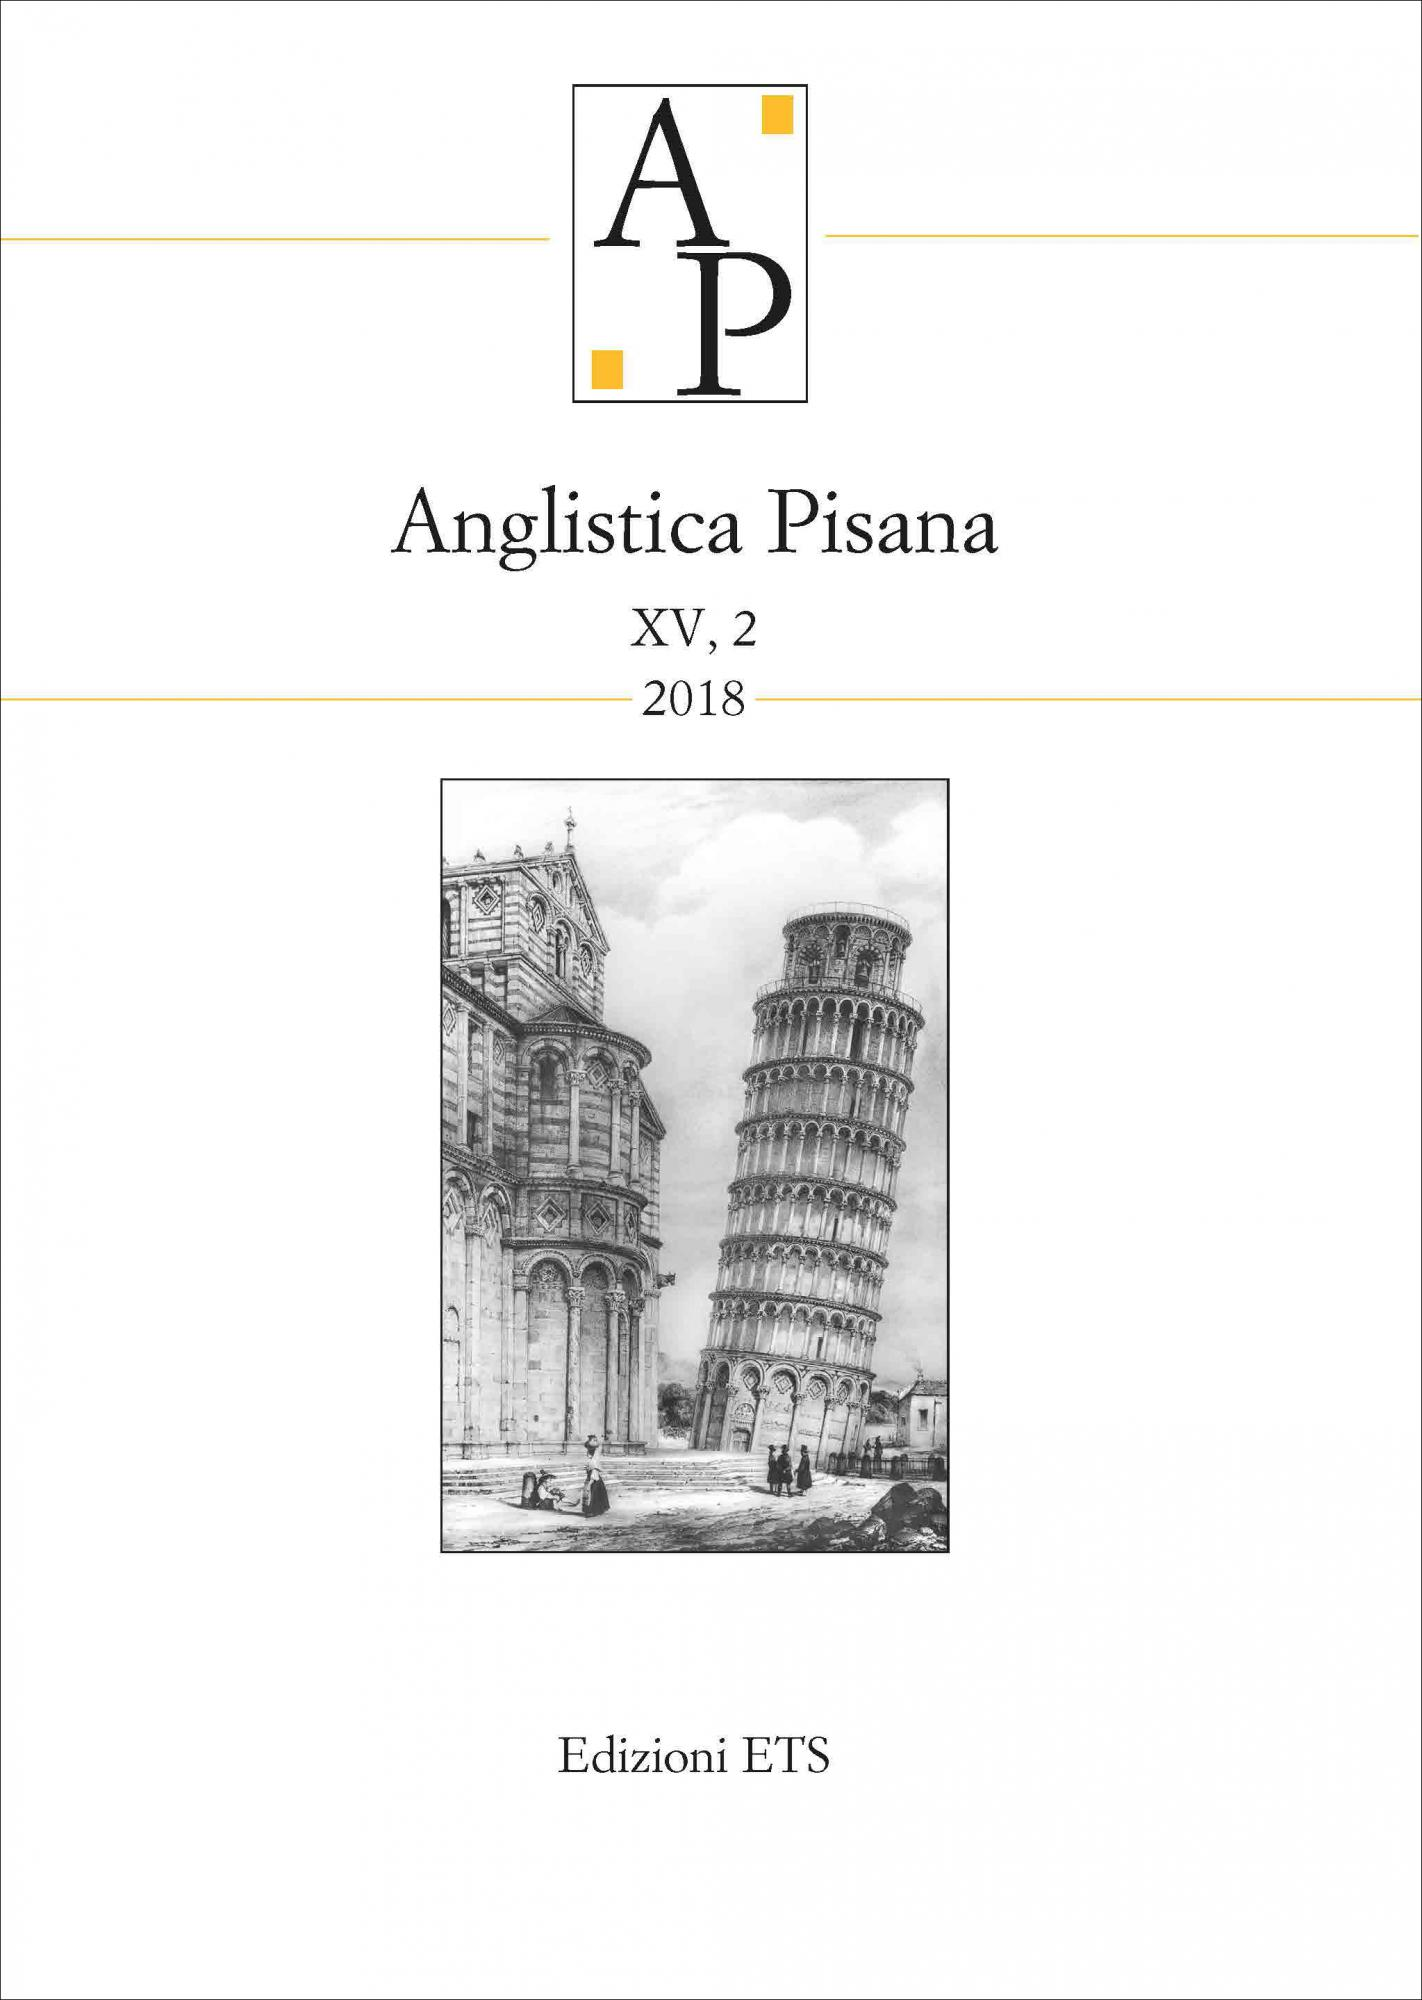 Anglistica Pisana XV, 2 2018